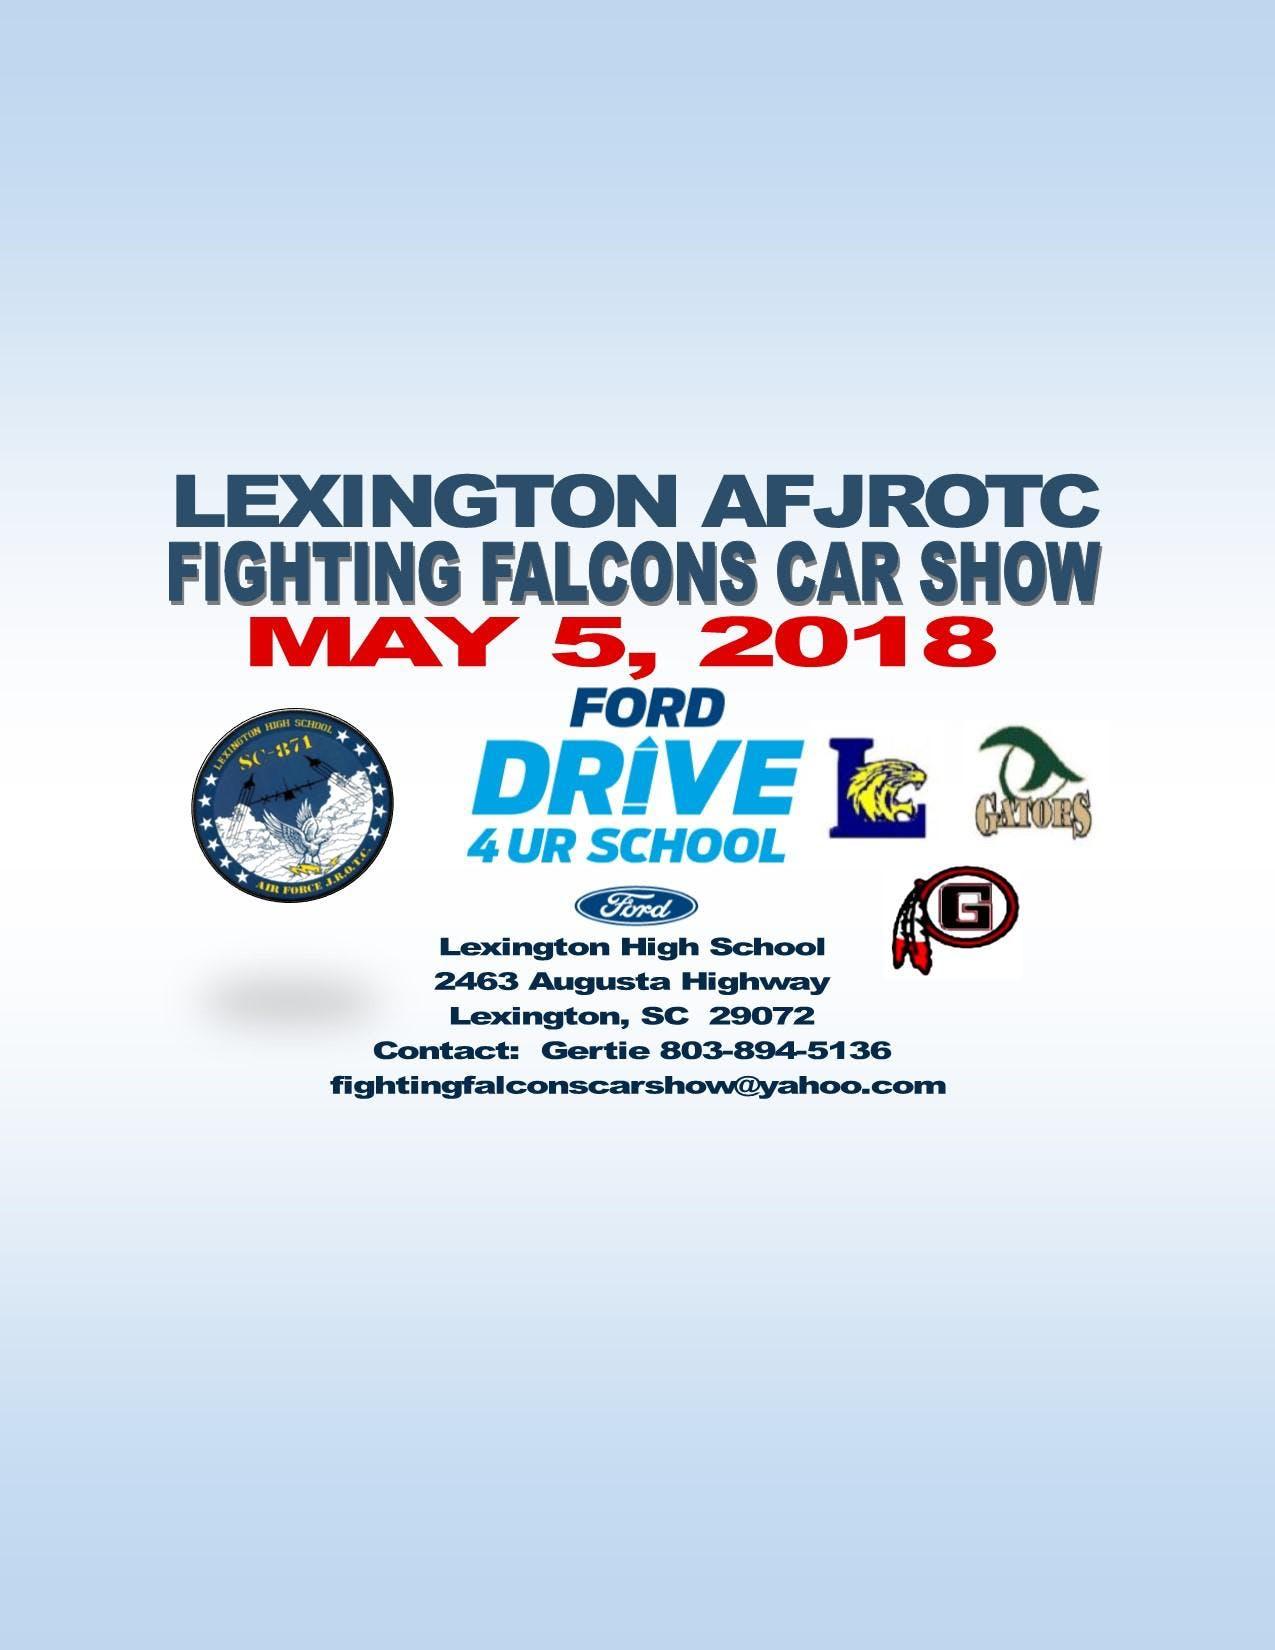 Lexington AFJROTC Fighting Falcons car show